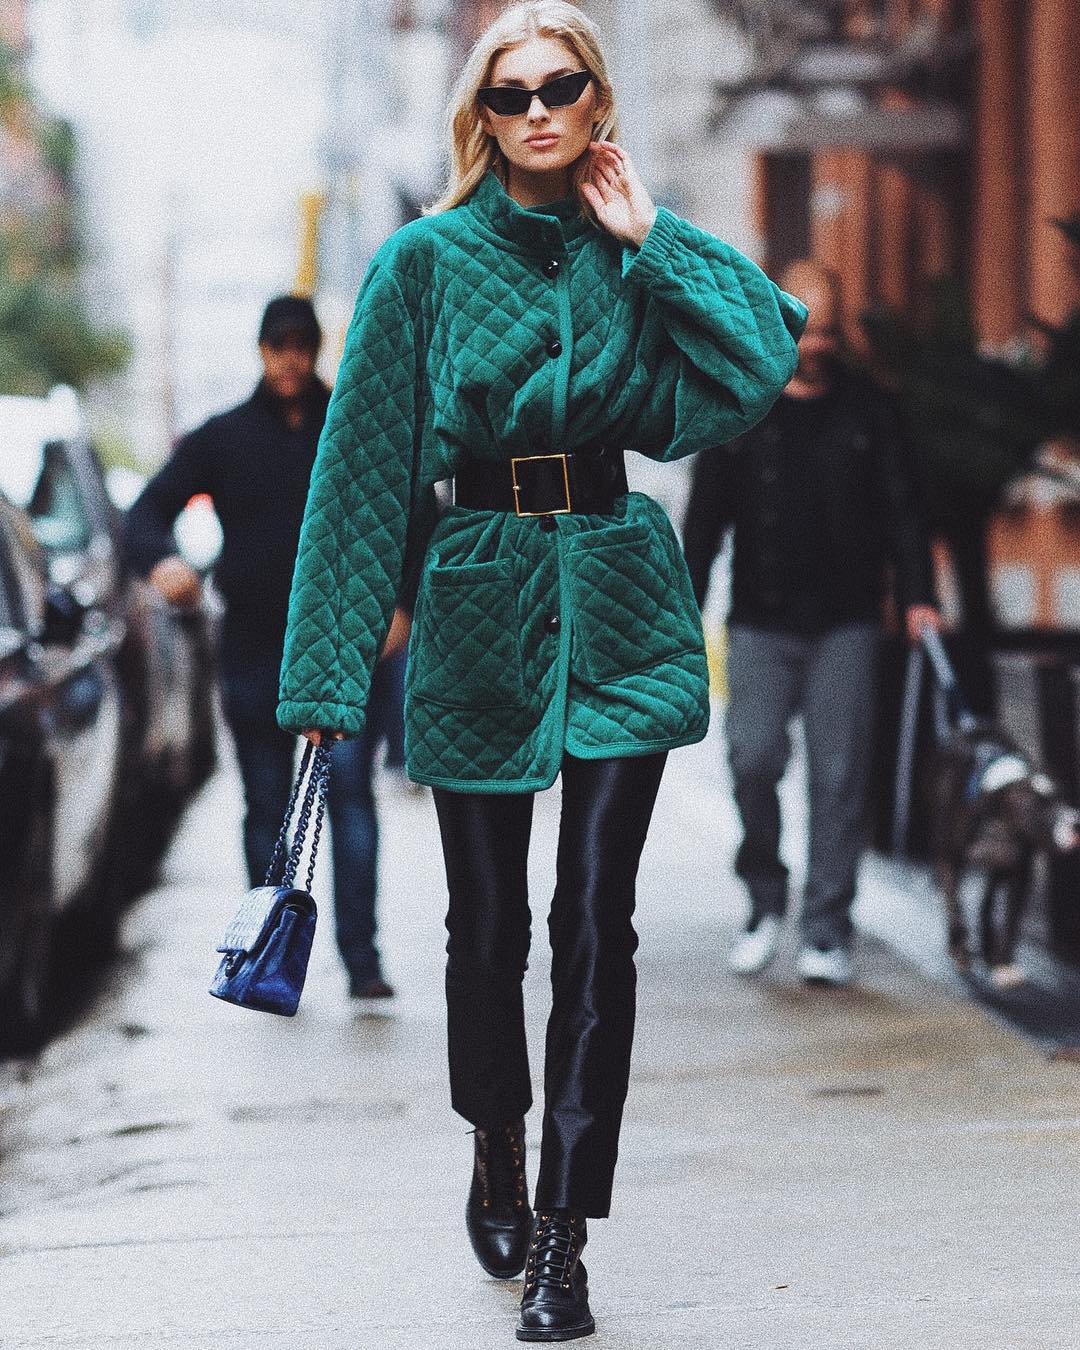 Elsa Hosk Wearing Green Velvet Quilted Coat With Shiny Black Pants 2020